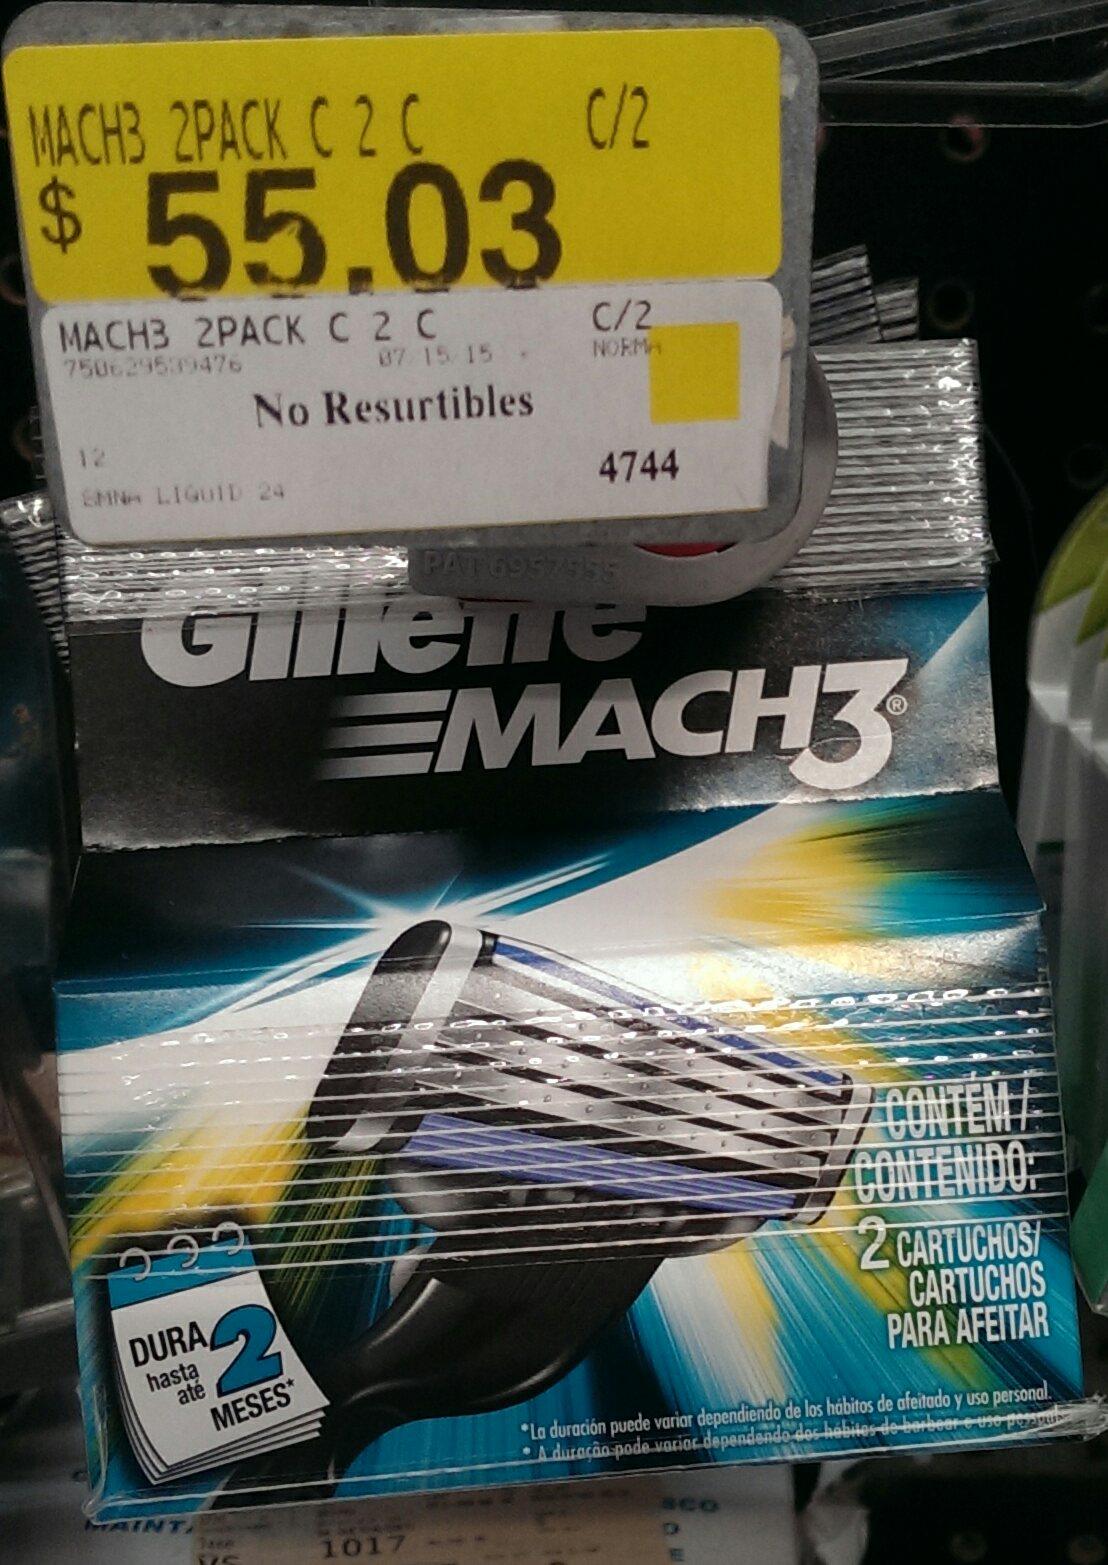 Bodega Aurrera: 2 cartuchos Mach3 en $55.03